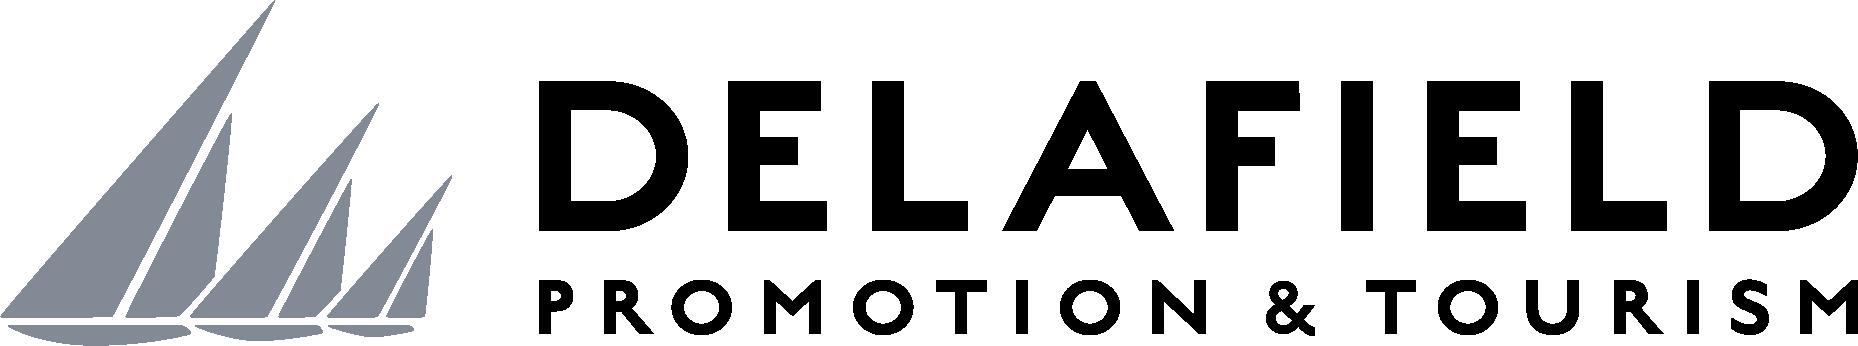 Delafield_Tourism_Logo_ltblue.png